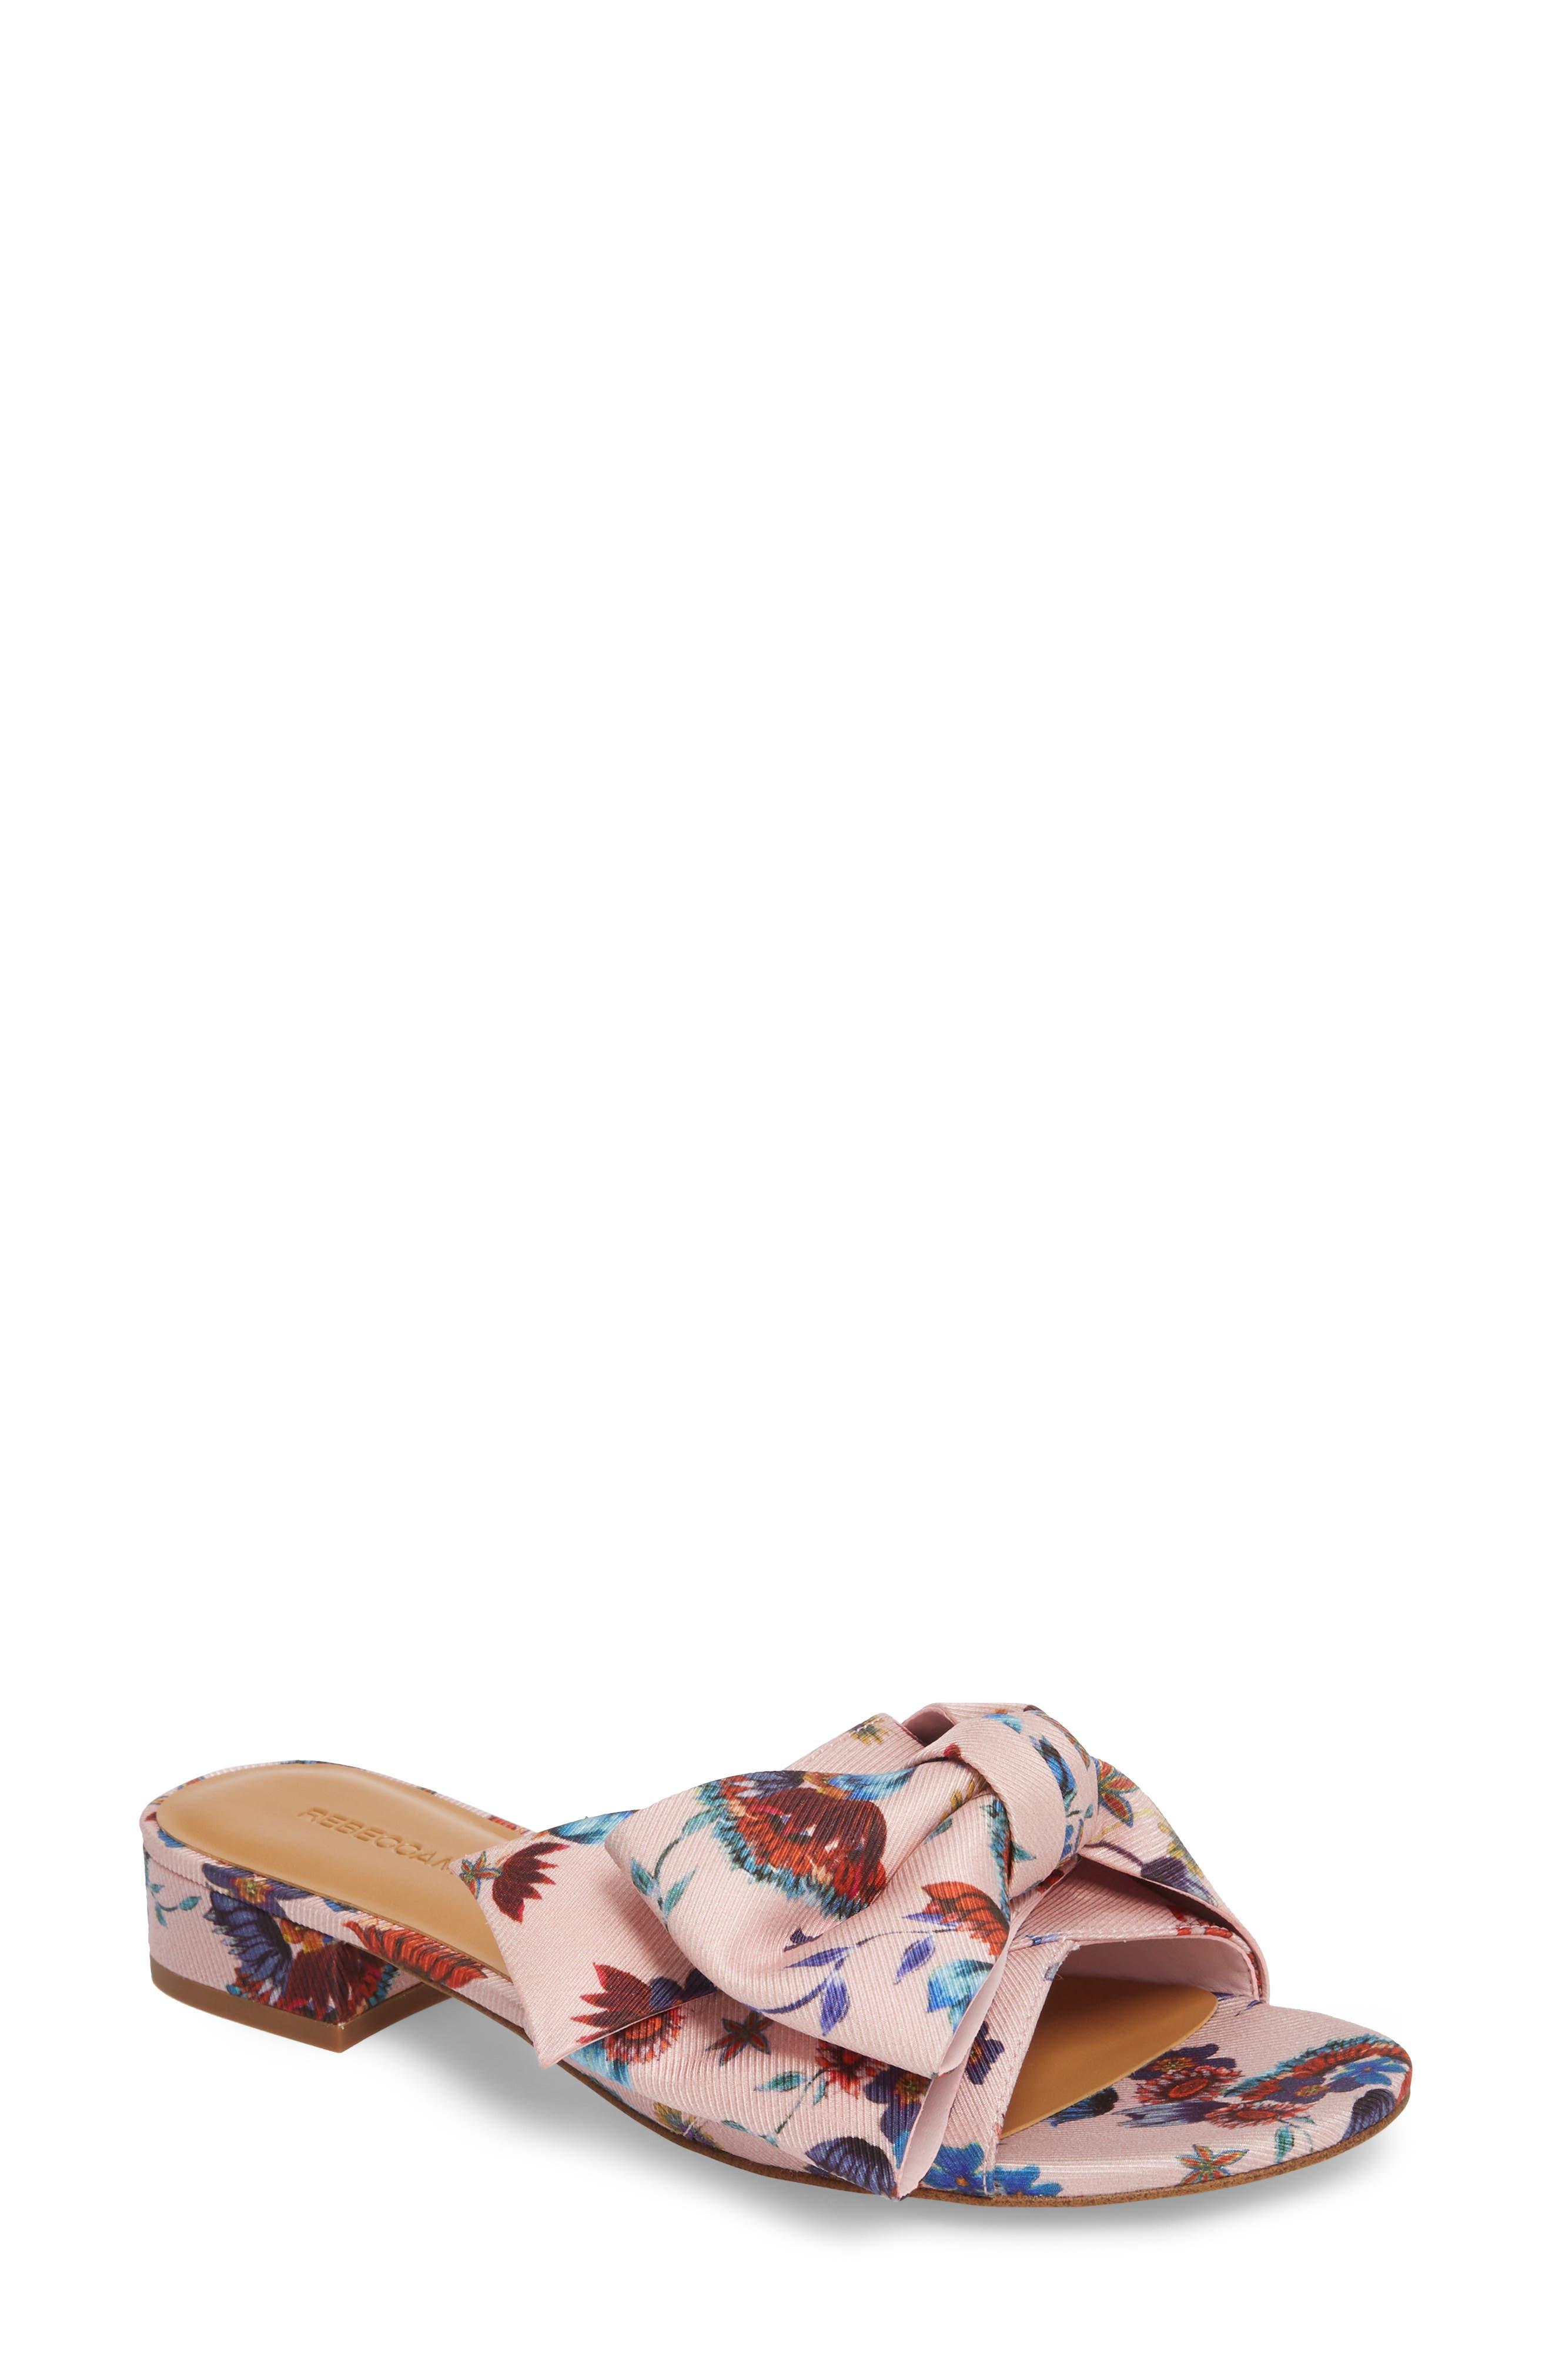 Calista Slide Sandal,                         Main,                         color, Millennial Pink Multi Fabric